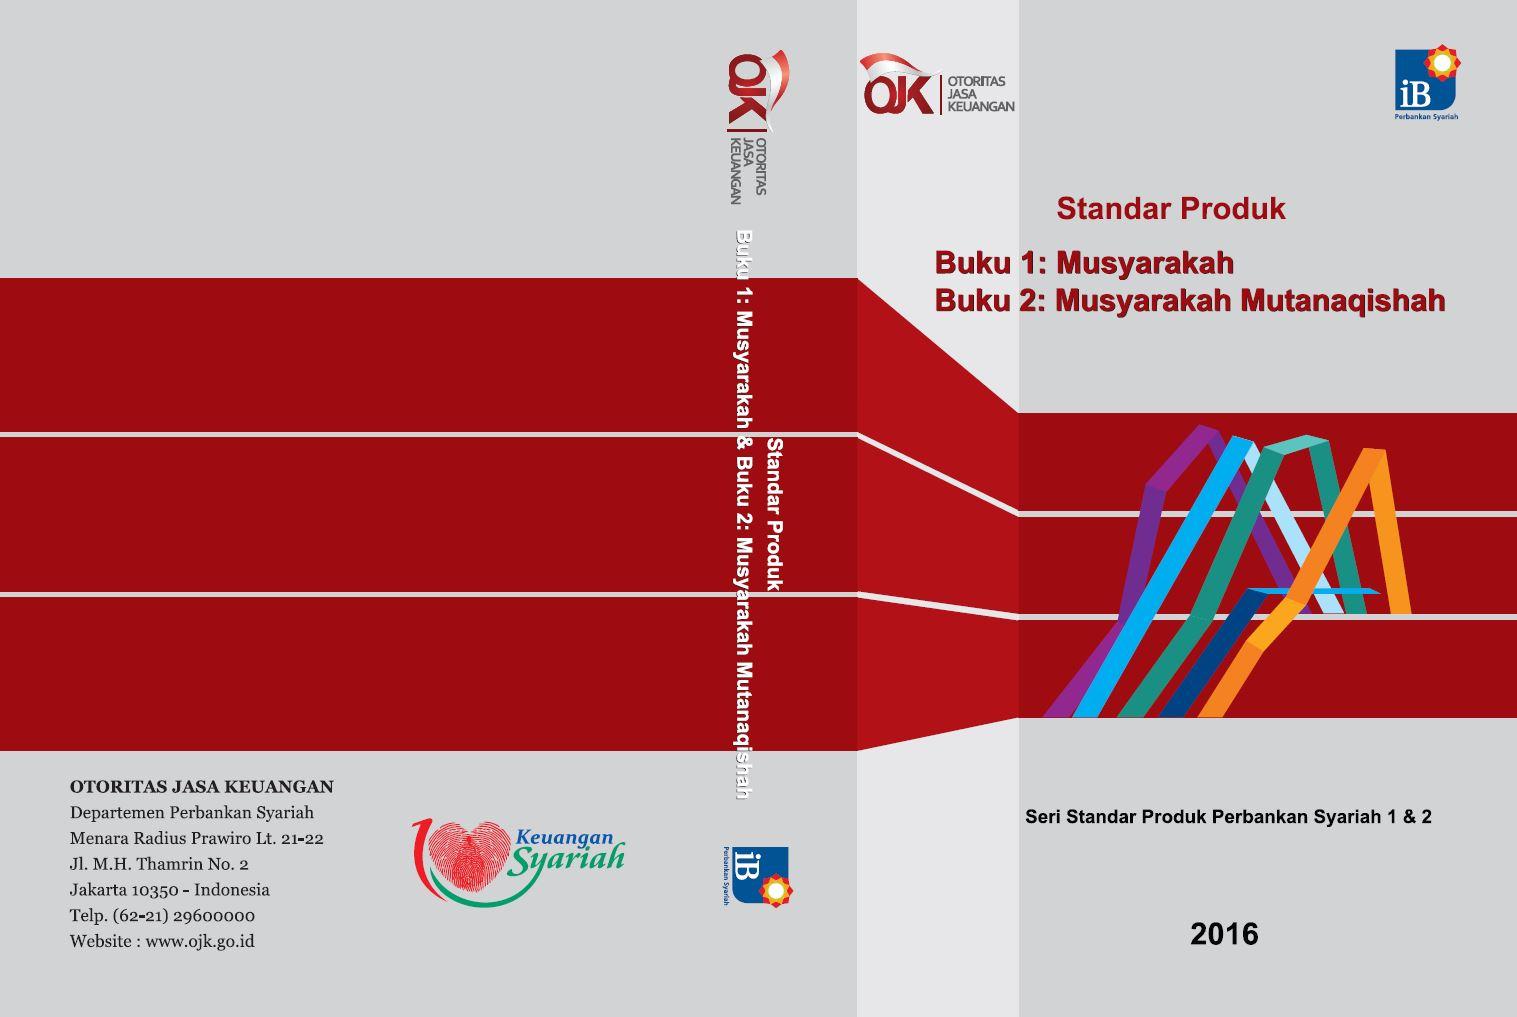 Ojk launches book on musyarakah and musyarakah mutanaqishah product ojk launches book on musyarakah and musyarakah mutanaqishah product standards ccuart Image collections